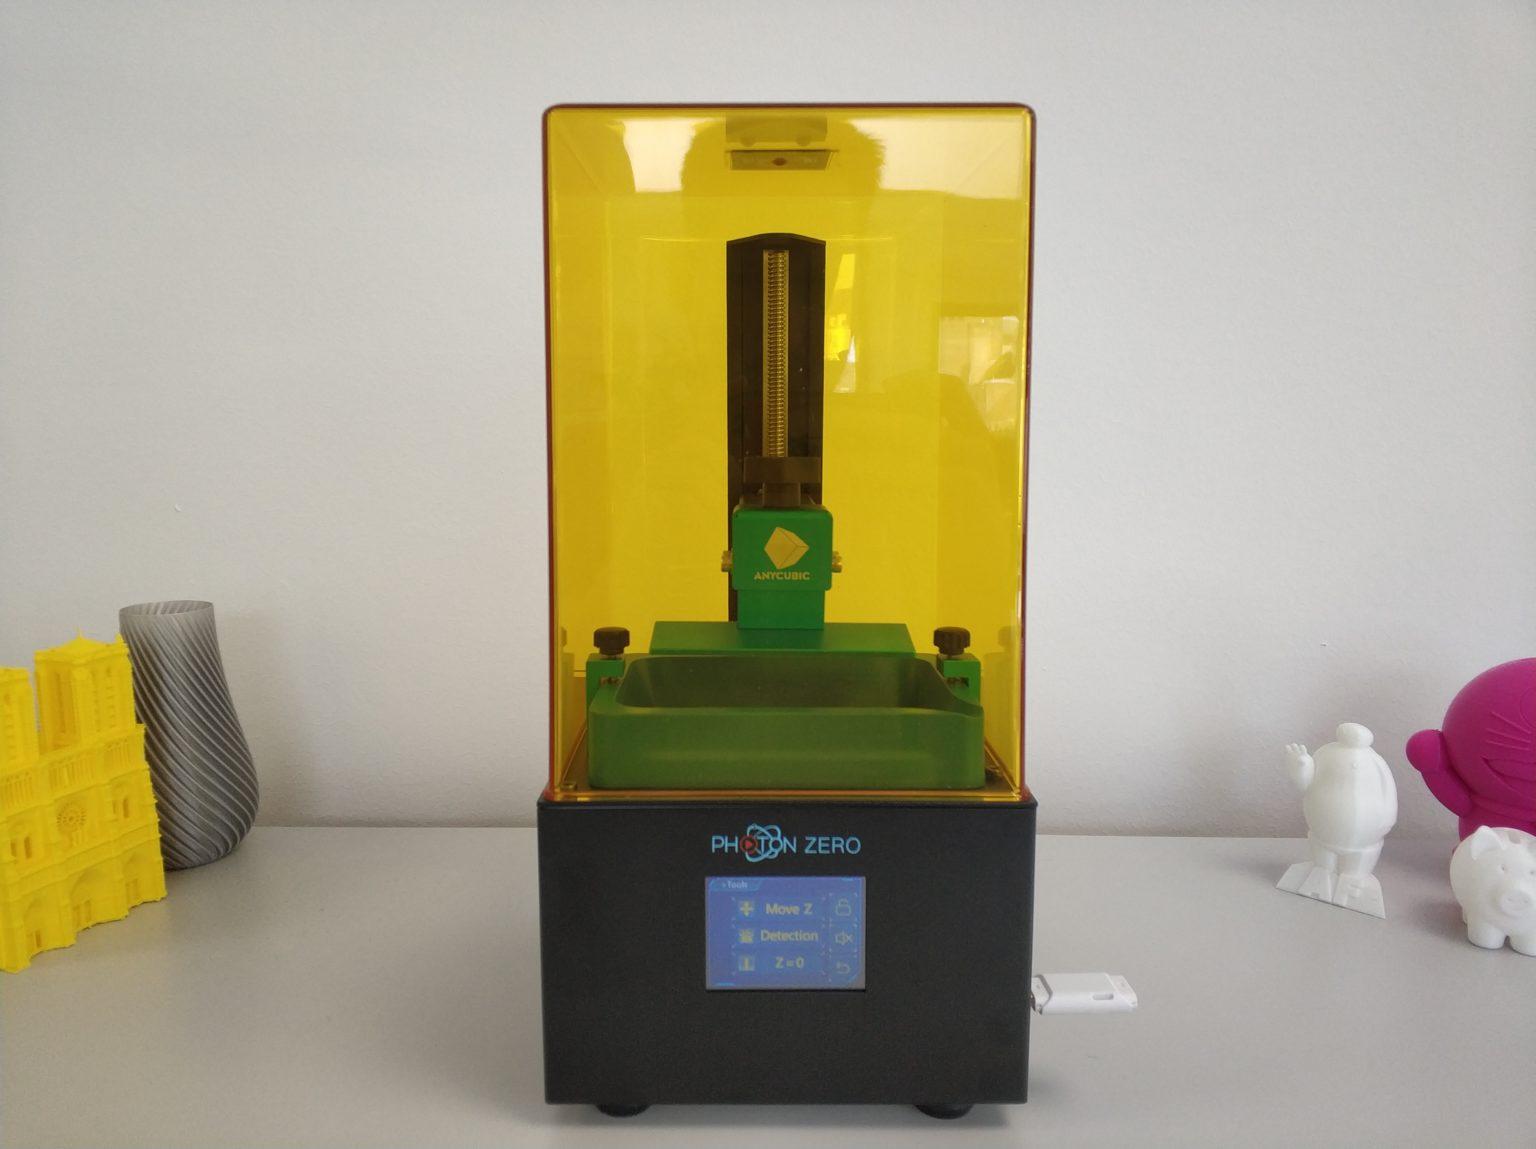 Impresora SLA Anycubic Photon Zero